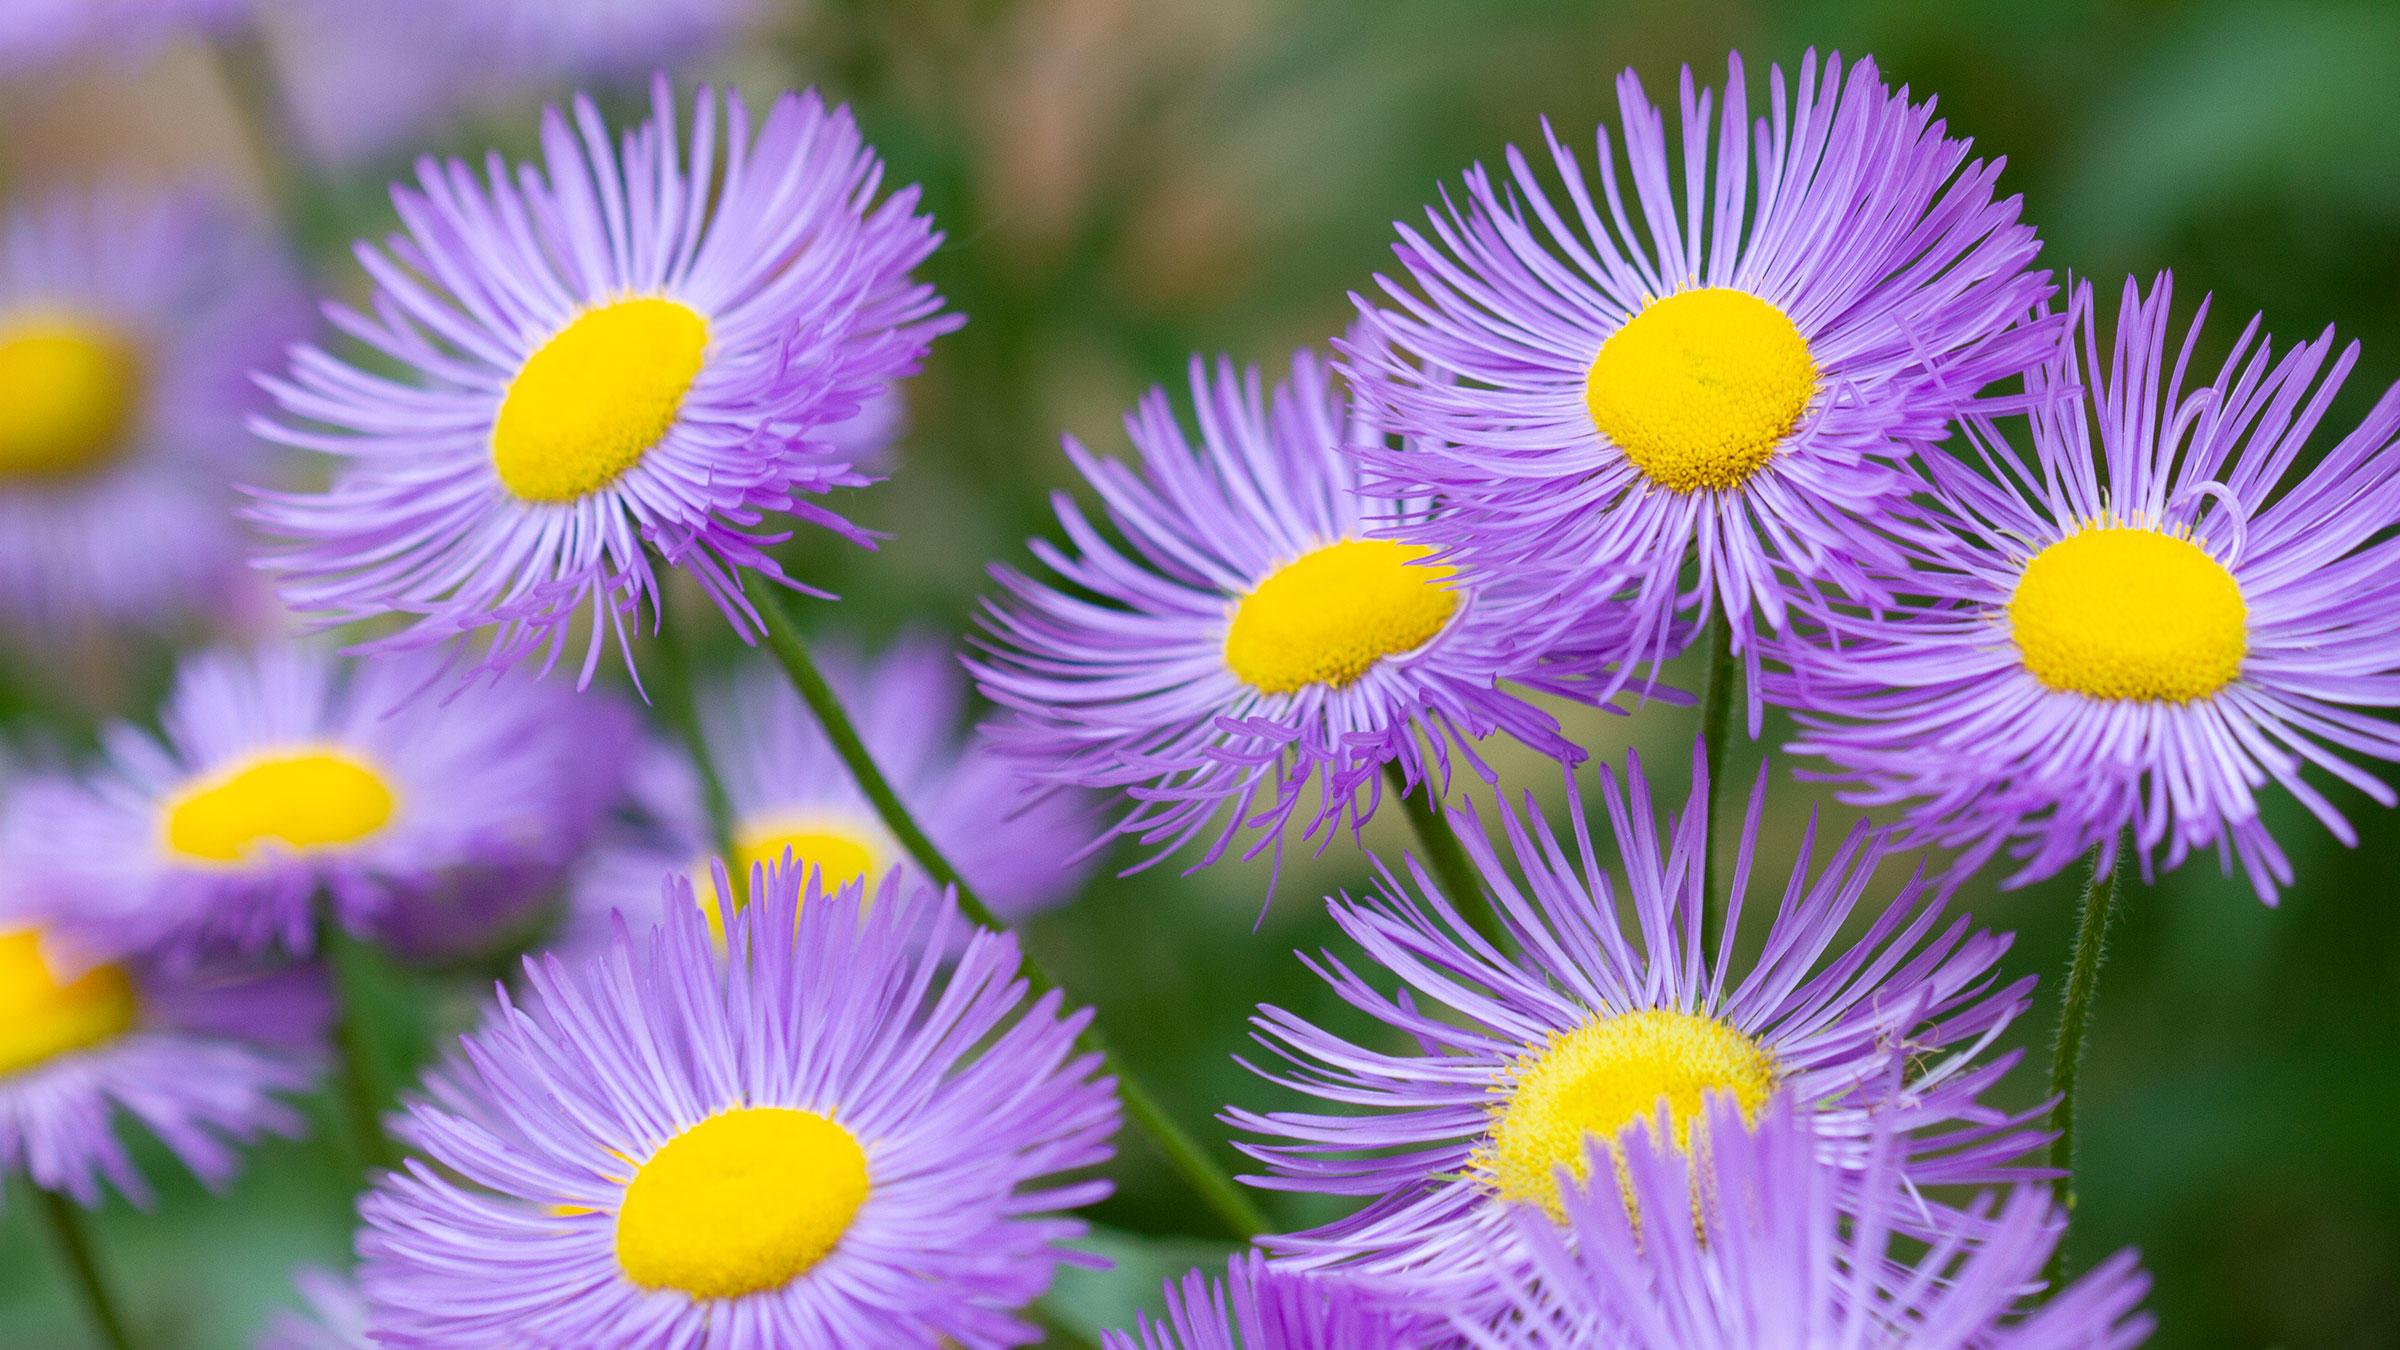 Purple Symphyotrichum novae-angliae flowers.